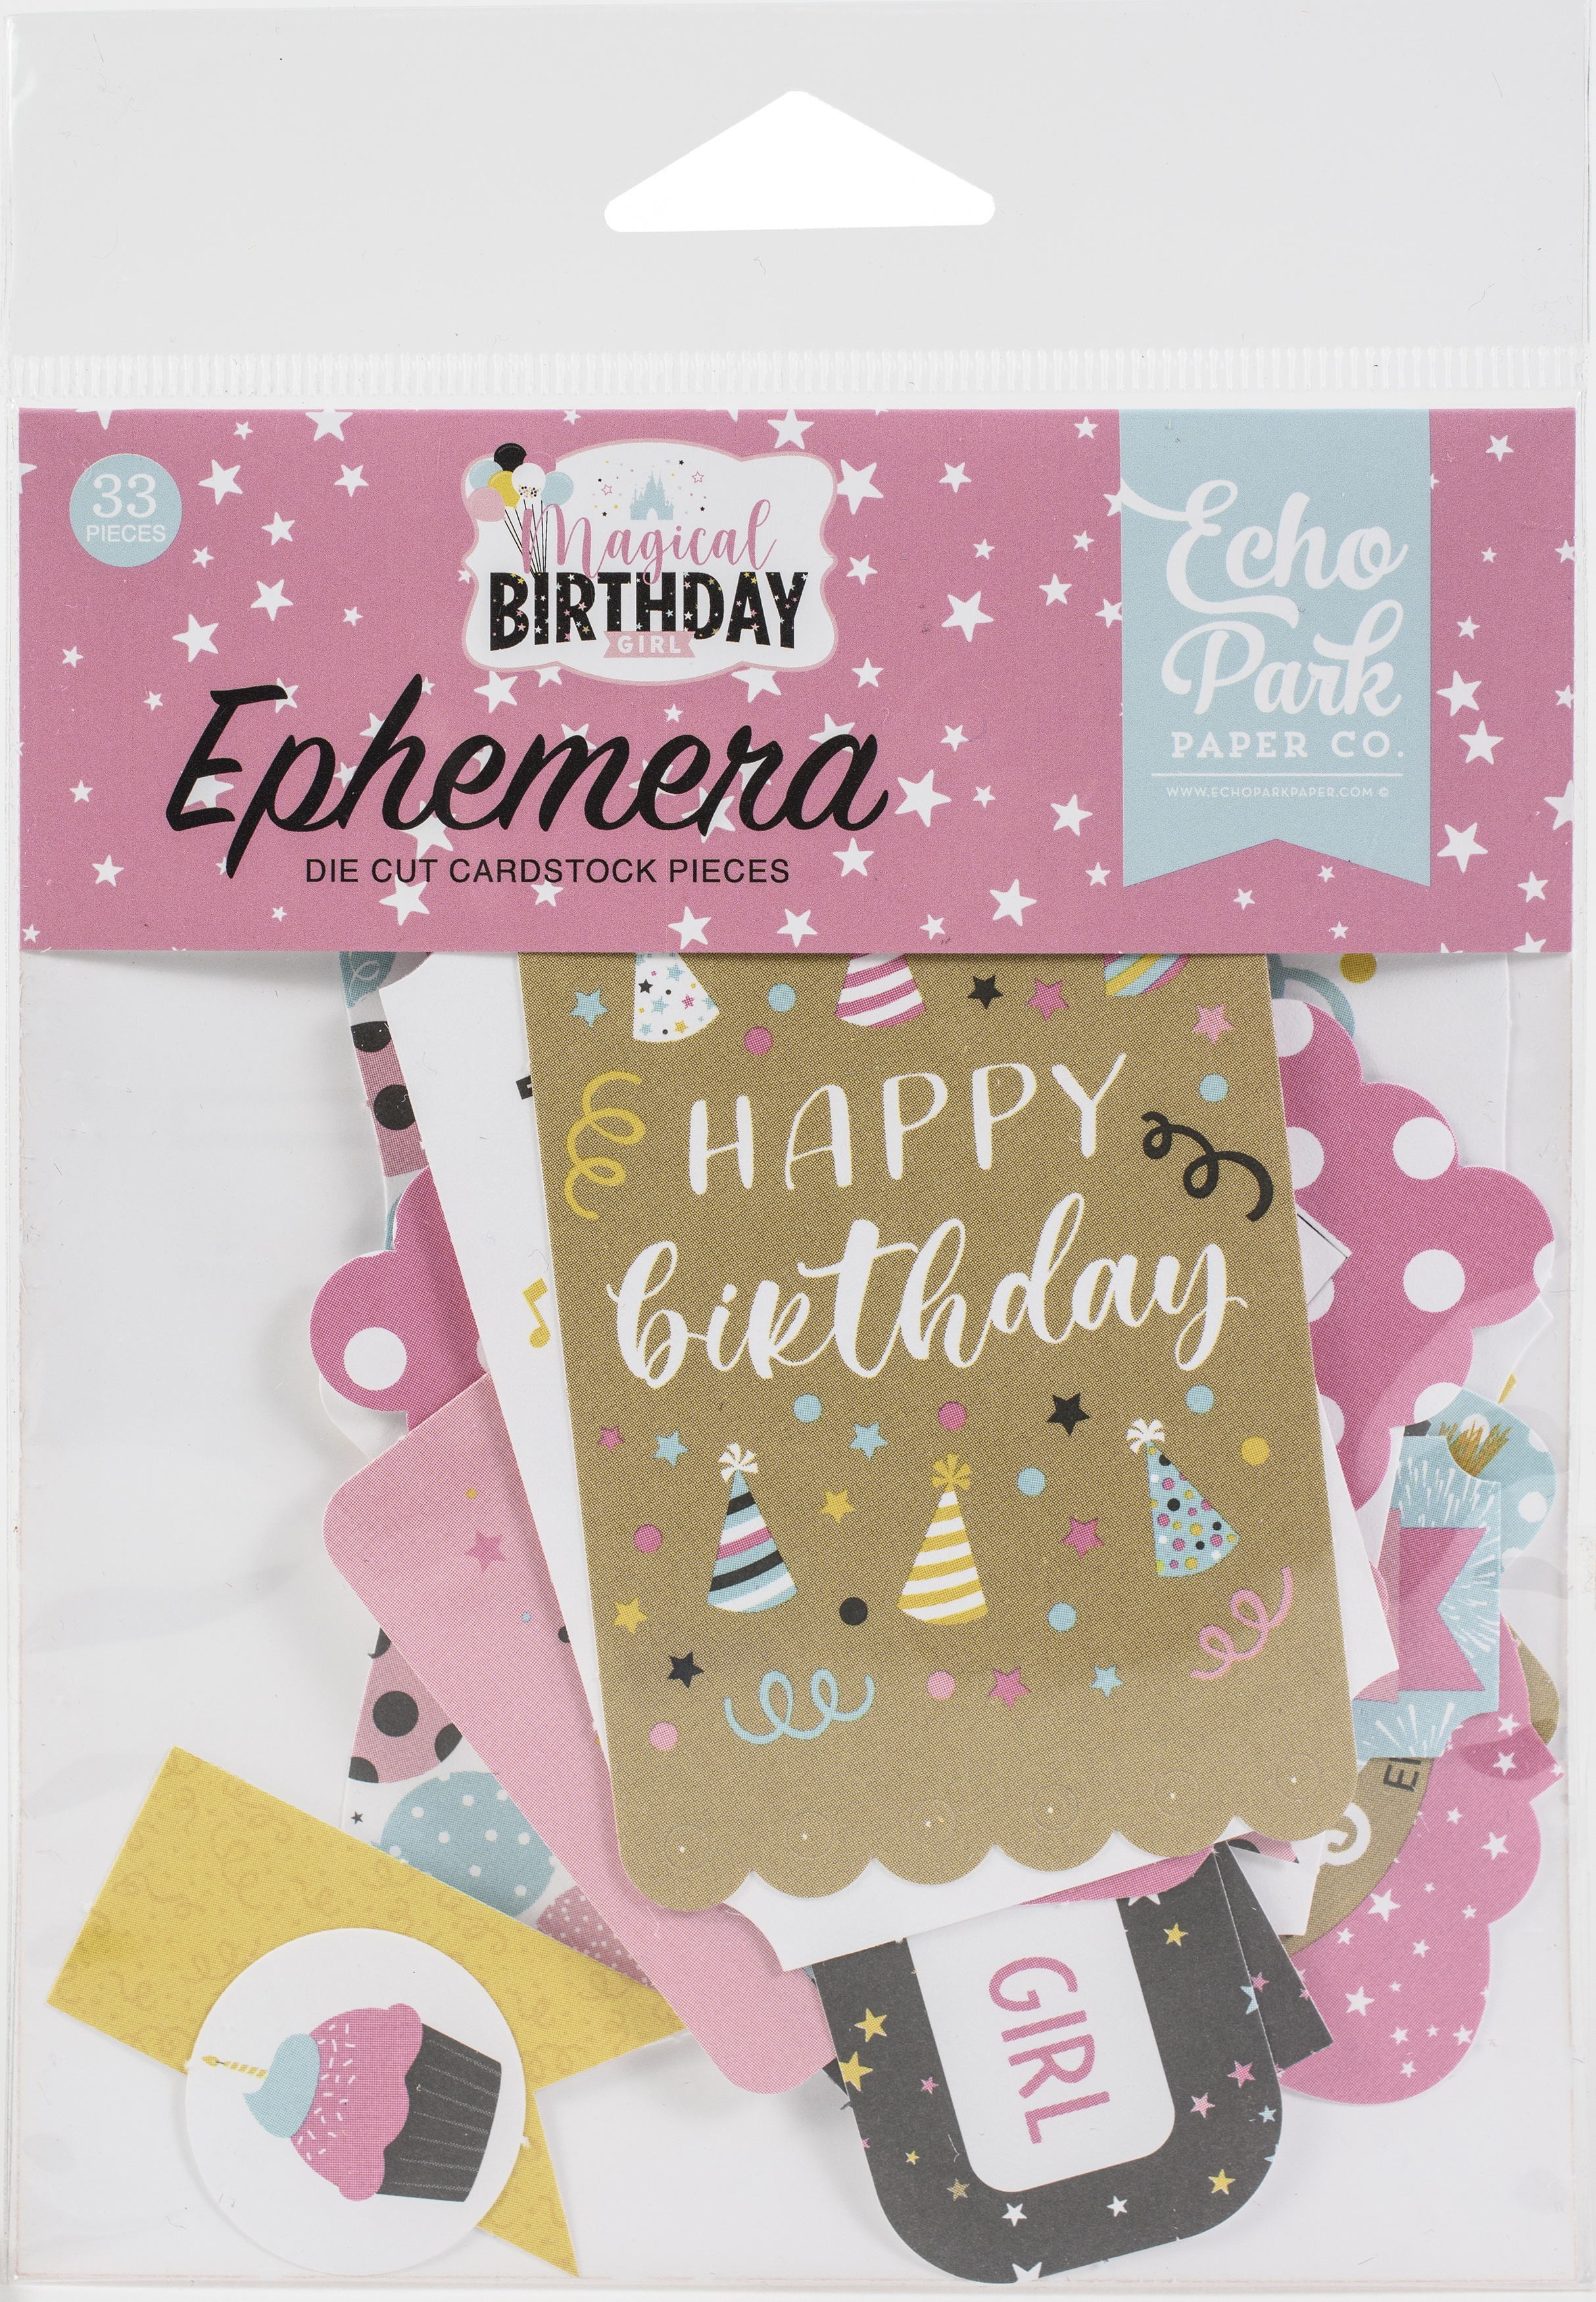 Echo Park Cardstock Ephemera 33/Pkg-Icons, Magical Birthday Girl